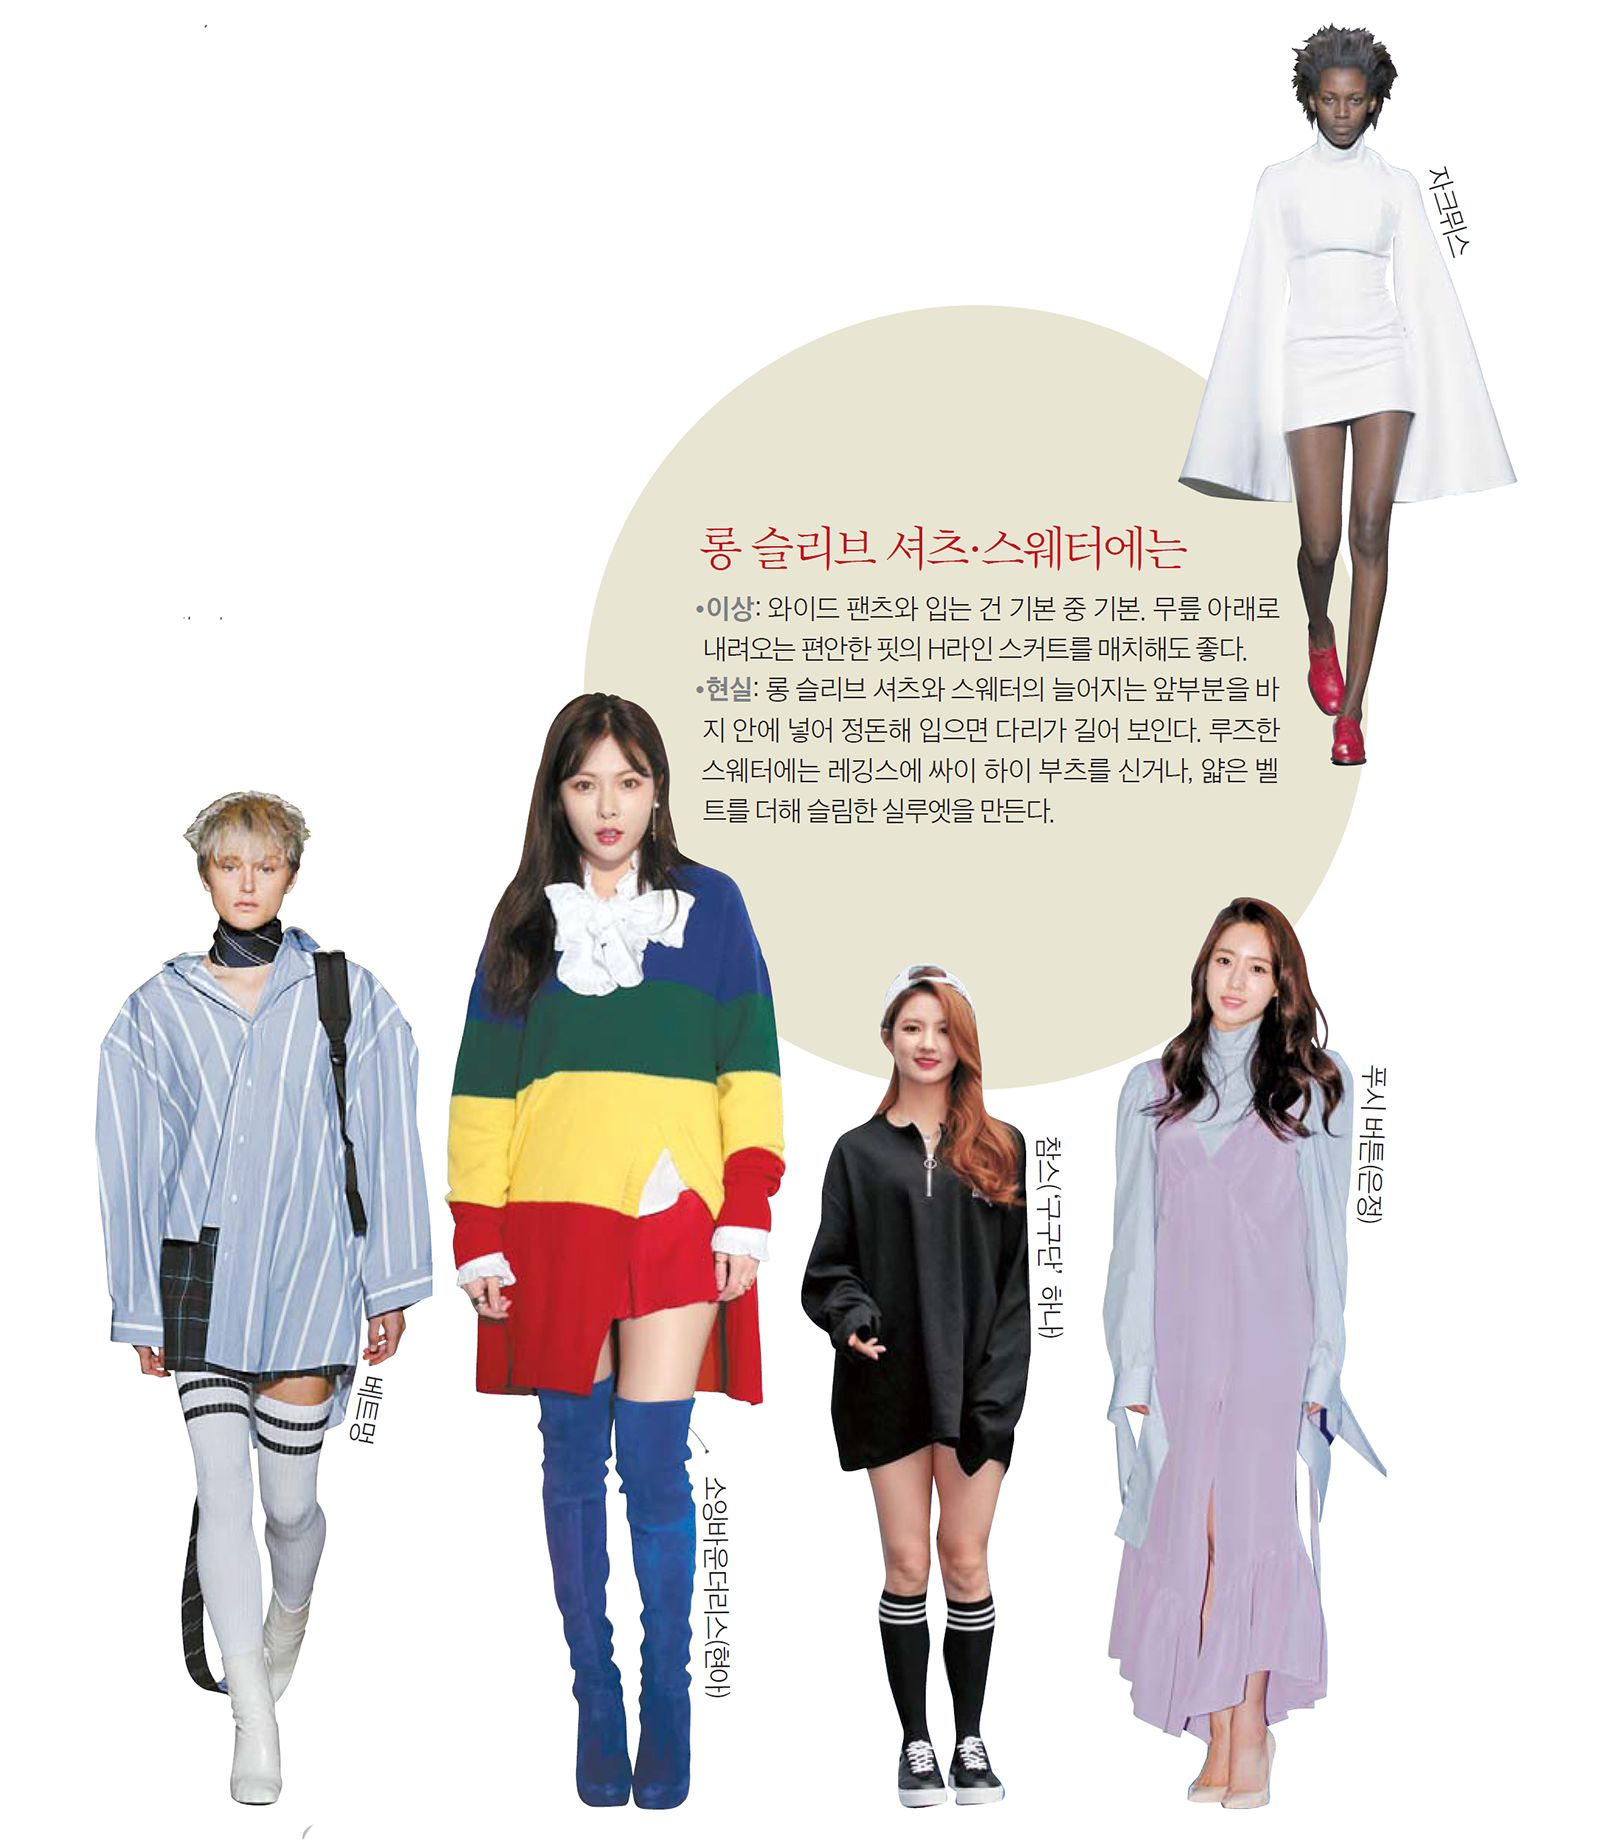 d2b39da8223 cover story] 다시 '오버'하라…XS 스키니 강박을 벗다 - 중앙일보